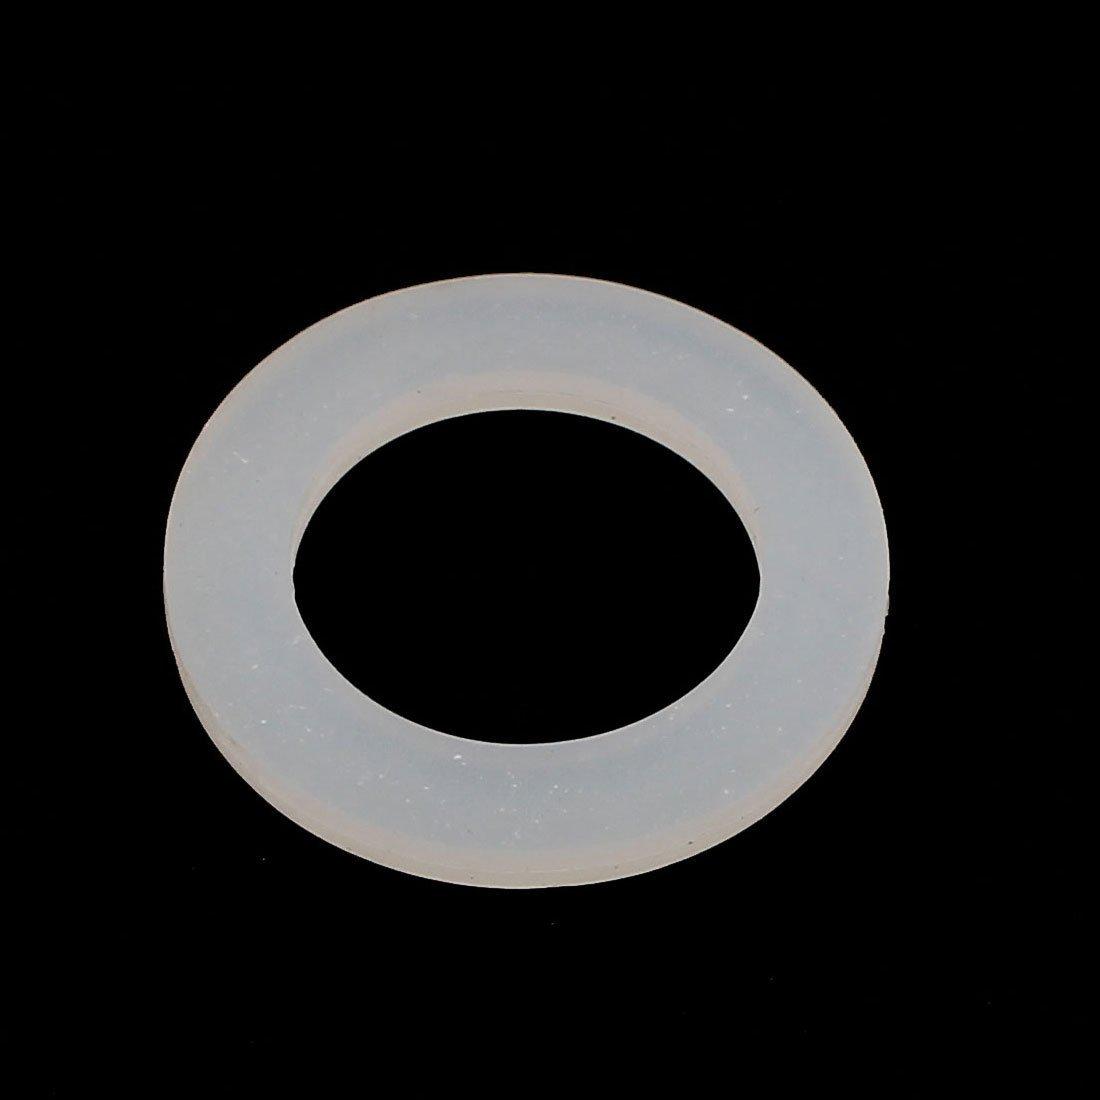 eDealMax 21 x 31 x 3 mm del anillo o de la manguera junta Plana arandela de goma Lote Para Calentador de agua 10pcs: Amazon.com: Industrial & Scientific